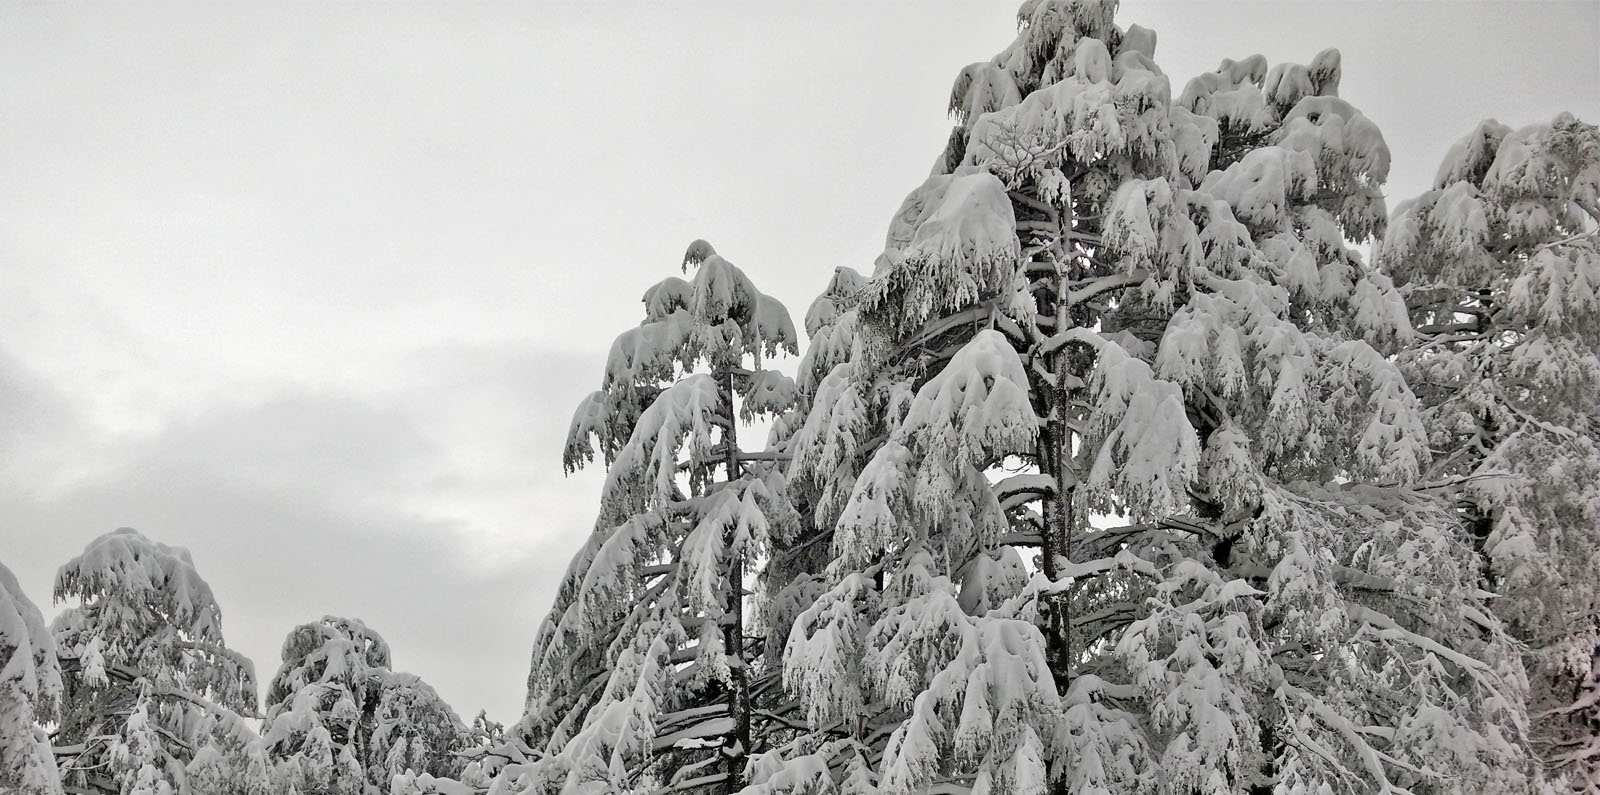 snowfall in himachal pradesh in 2020